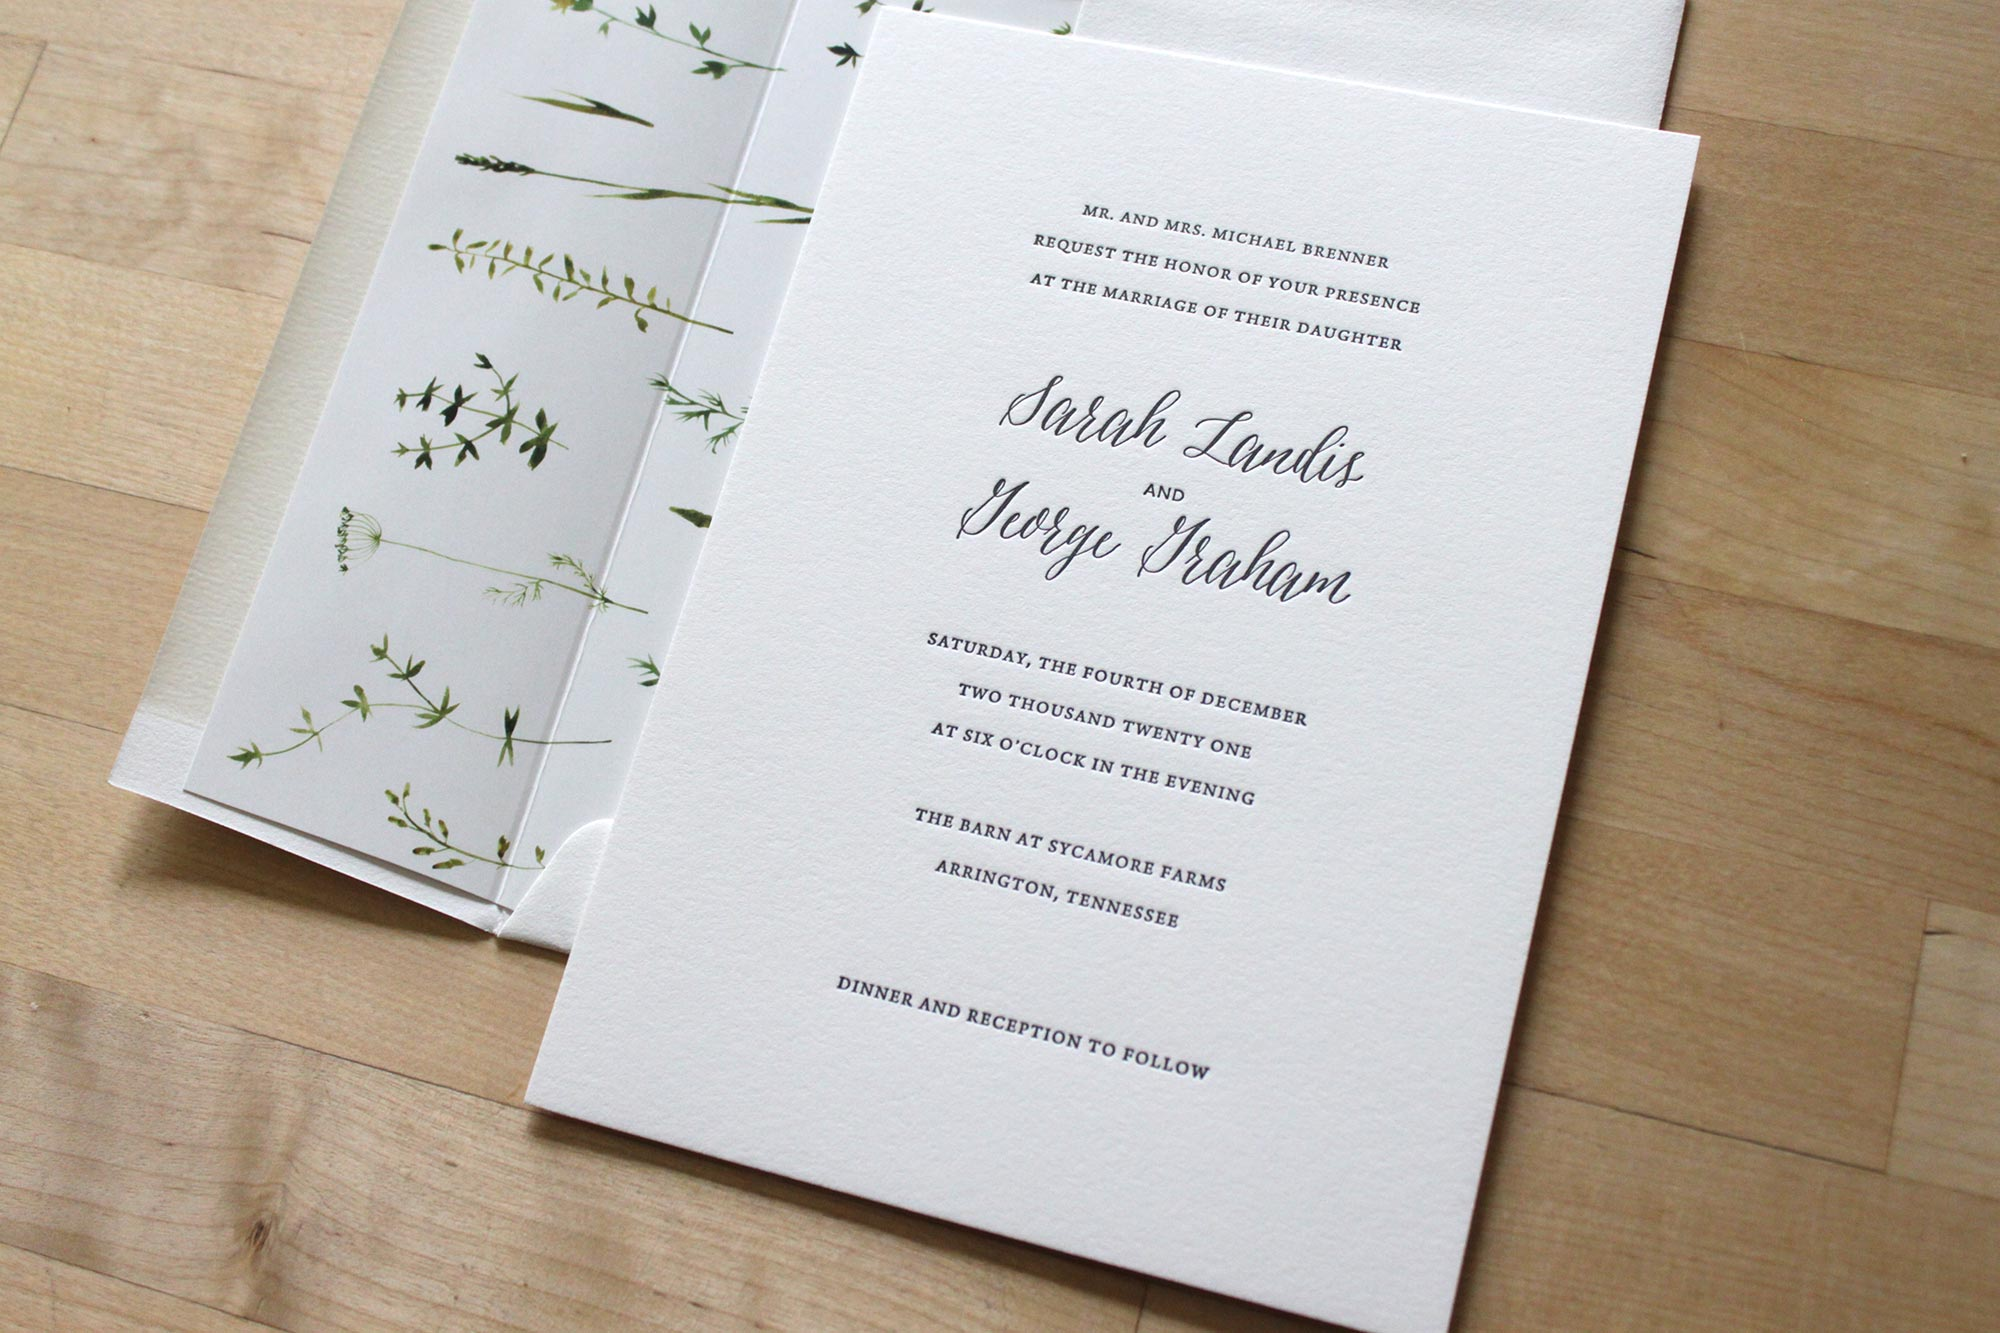 Scripted-Names-Letterpress-Wedding-Invitation.jpg